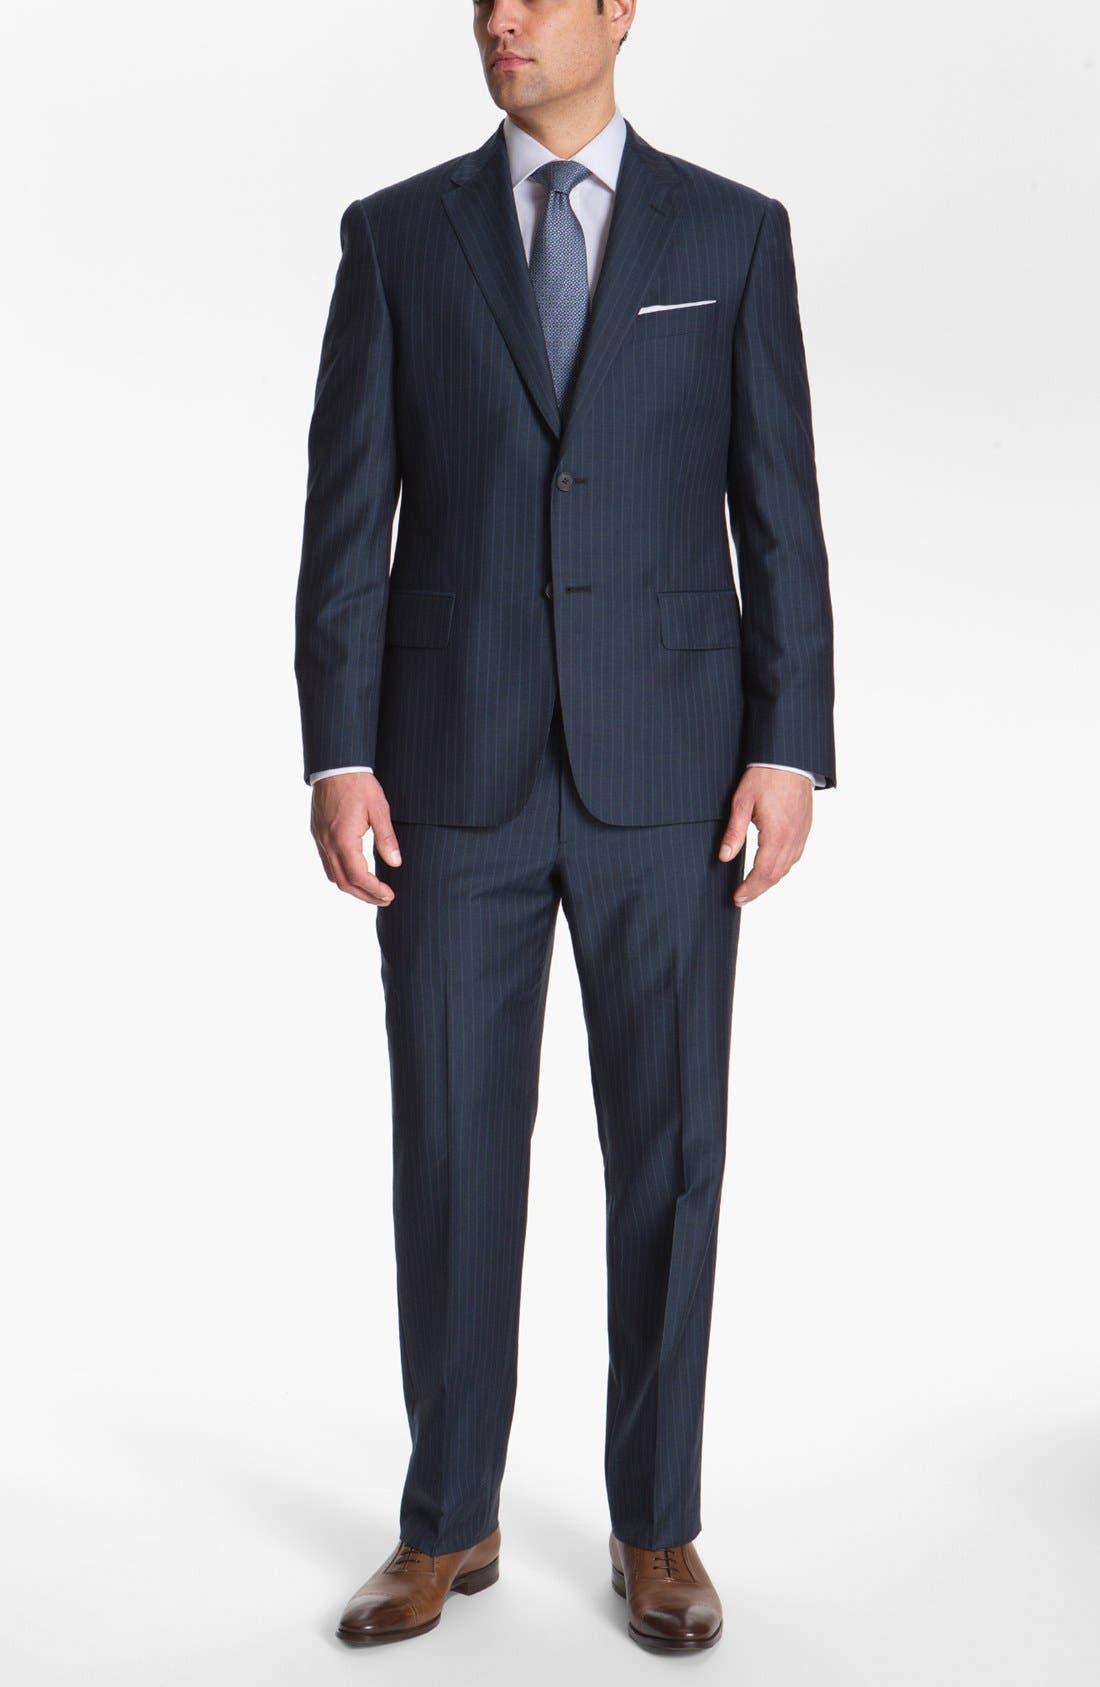 Main Image - Joseph Abboud 'Platinum' Stripe Wool Suit